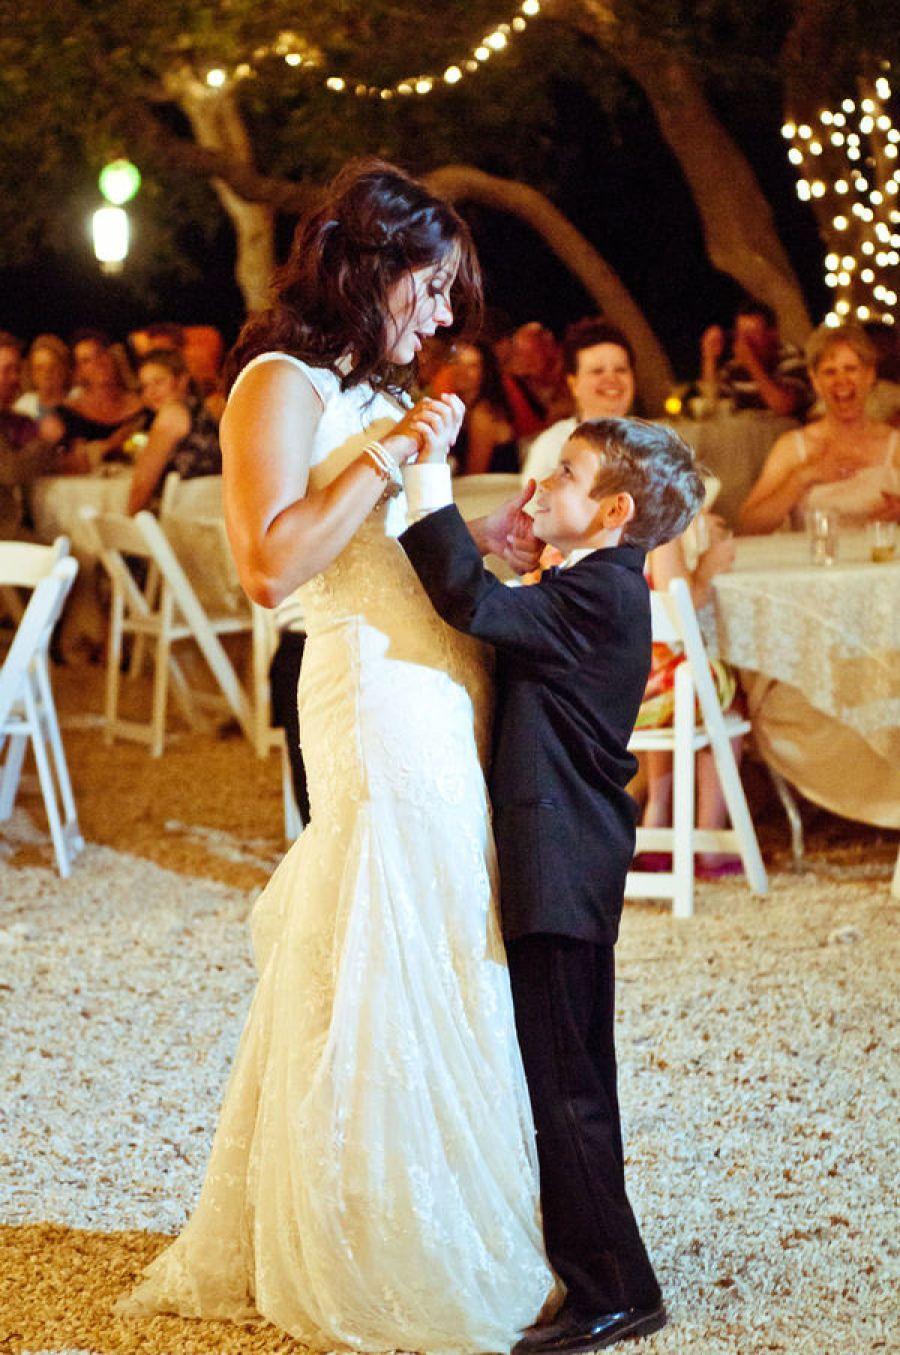 I Do, Round 2: How to Plan Your Second Wedding | Weddings, Wedding ...